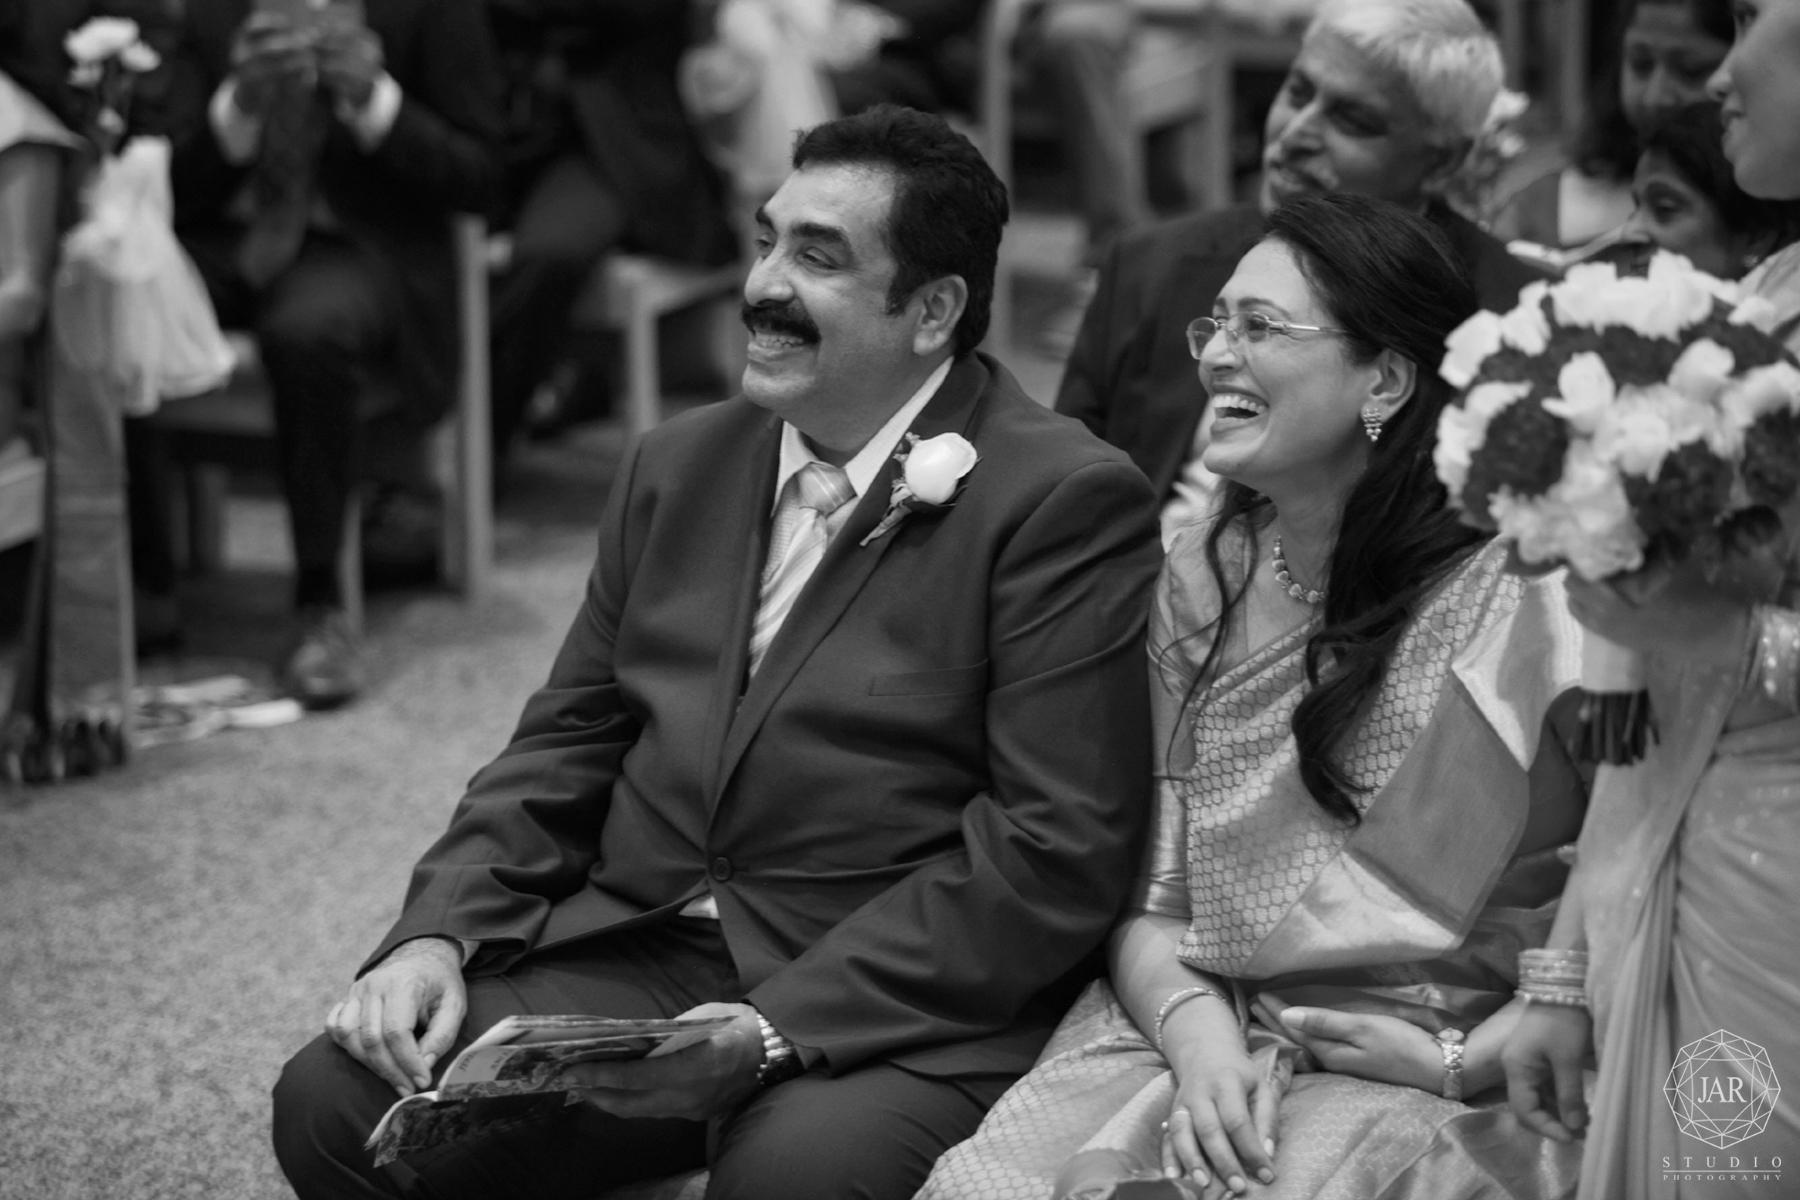 17-family-fun-indian-wedding-ceremony-jarstudio-photography.jpg